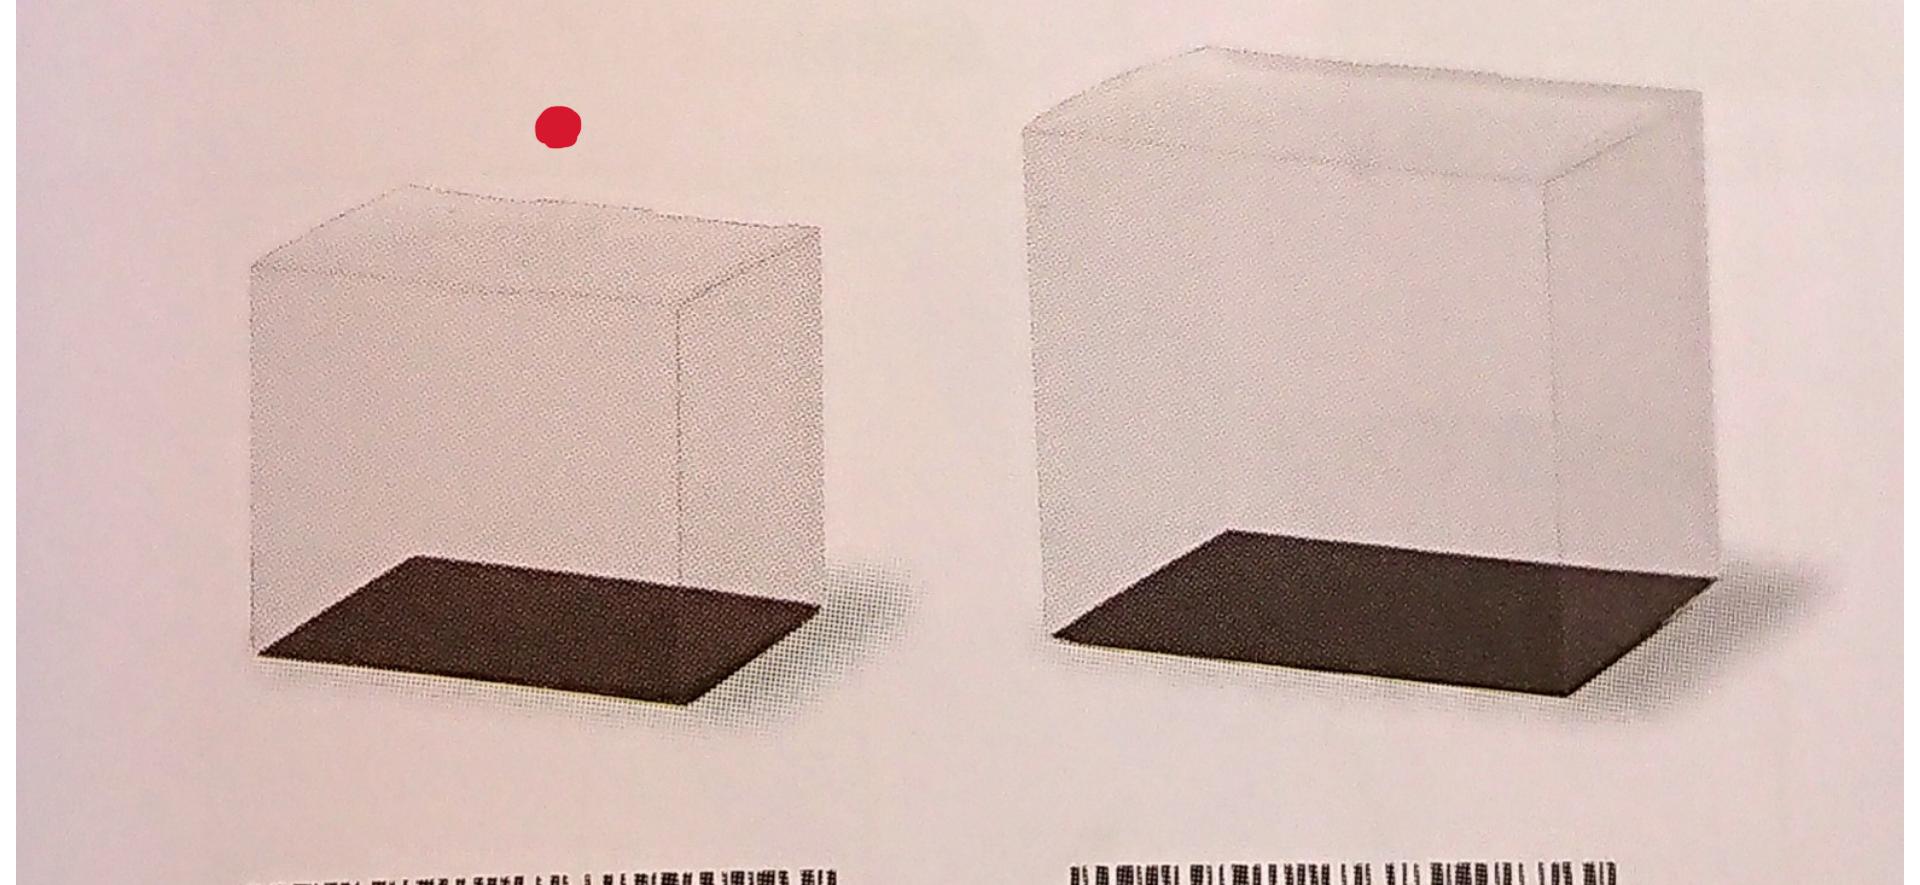 122-860001-0